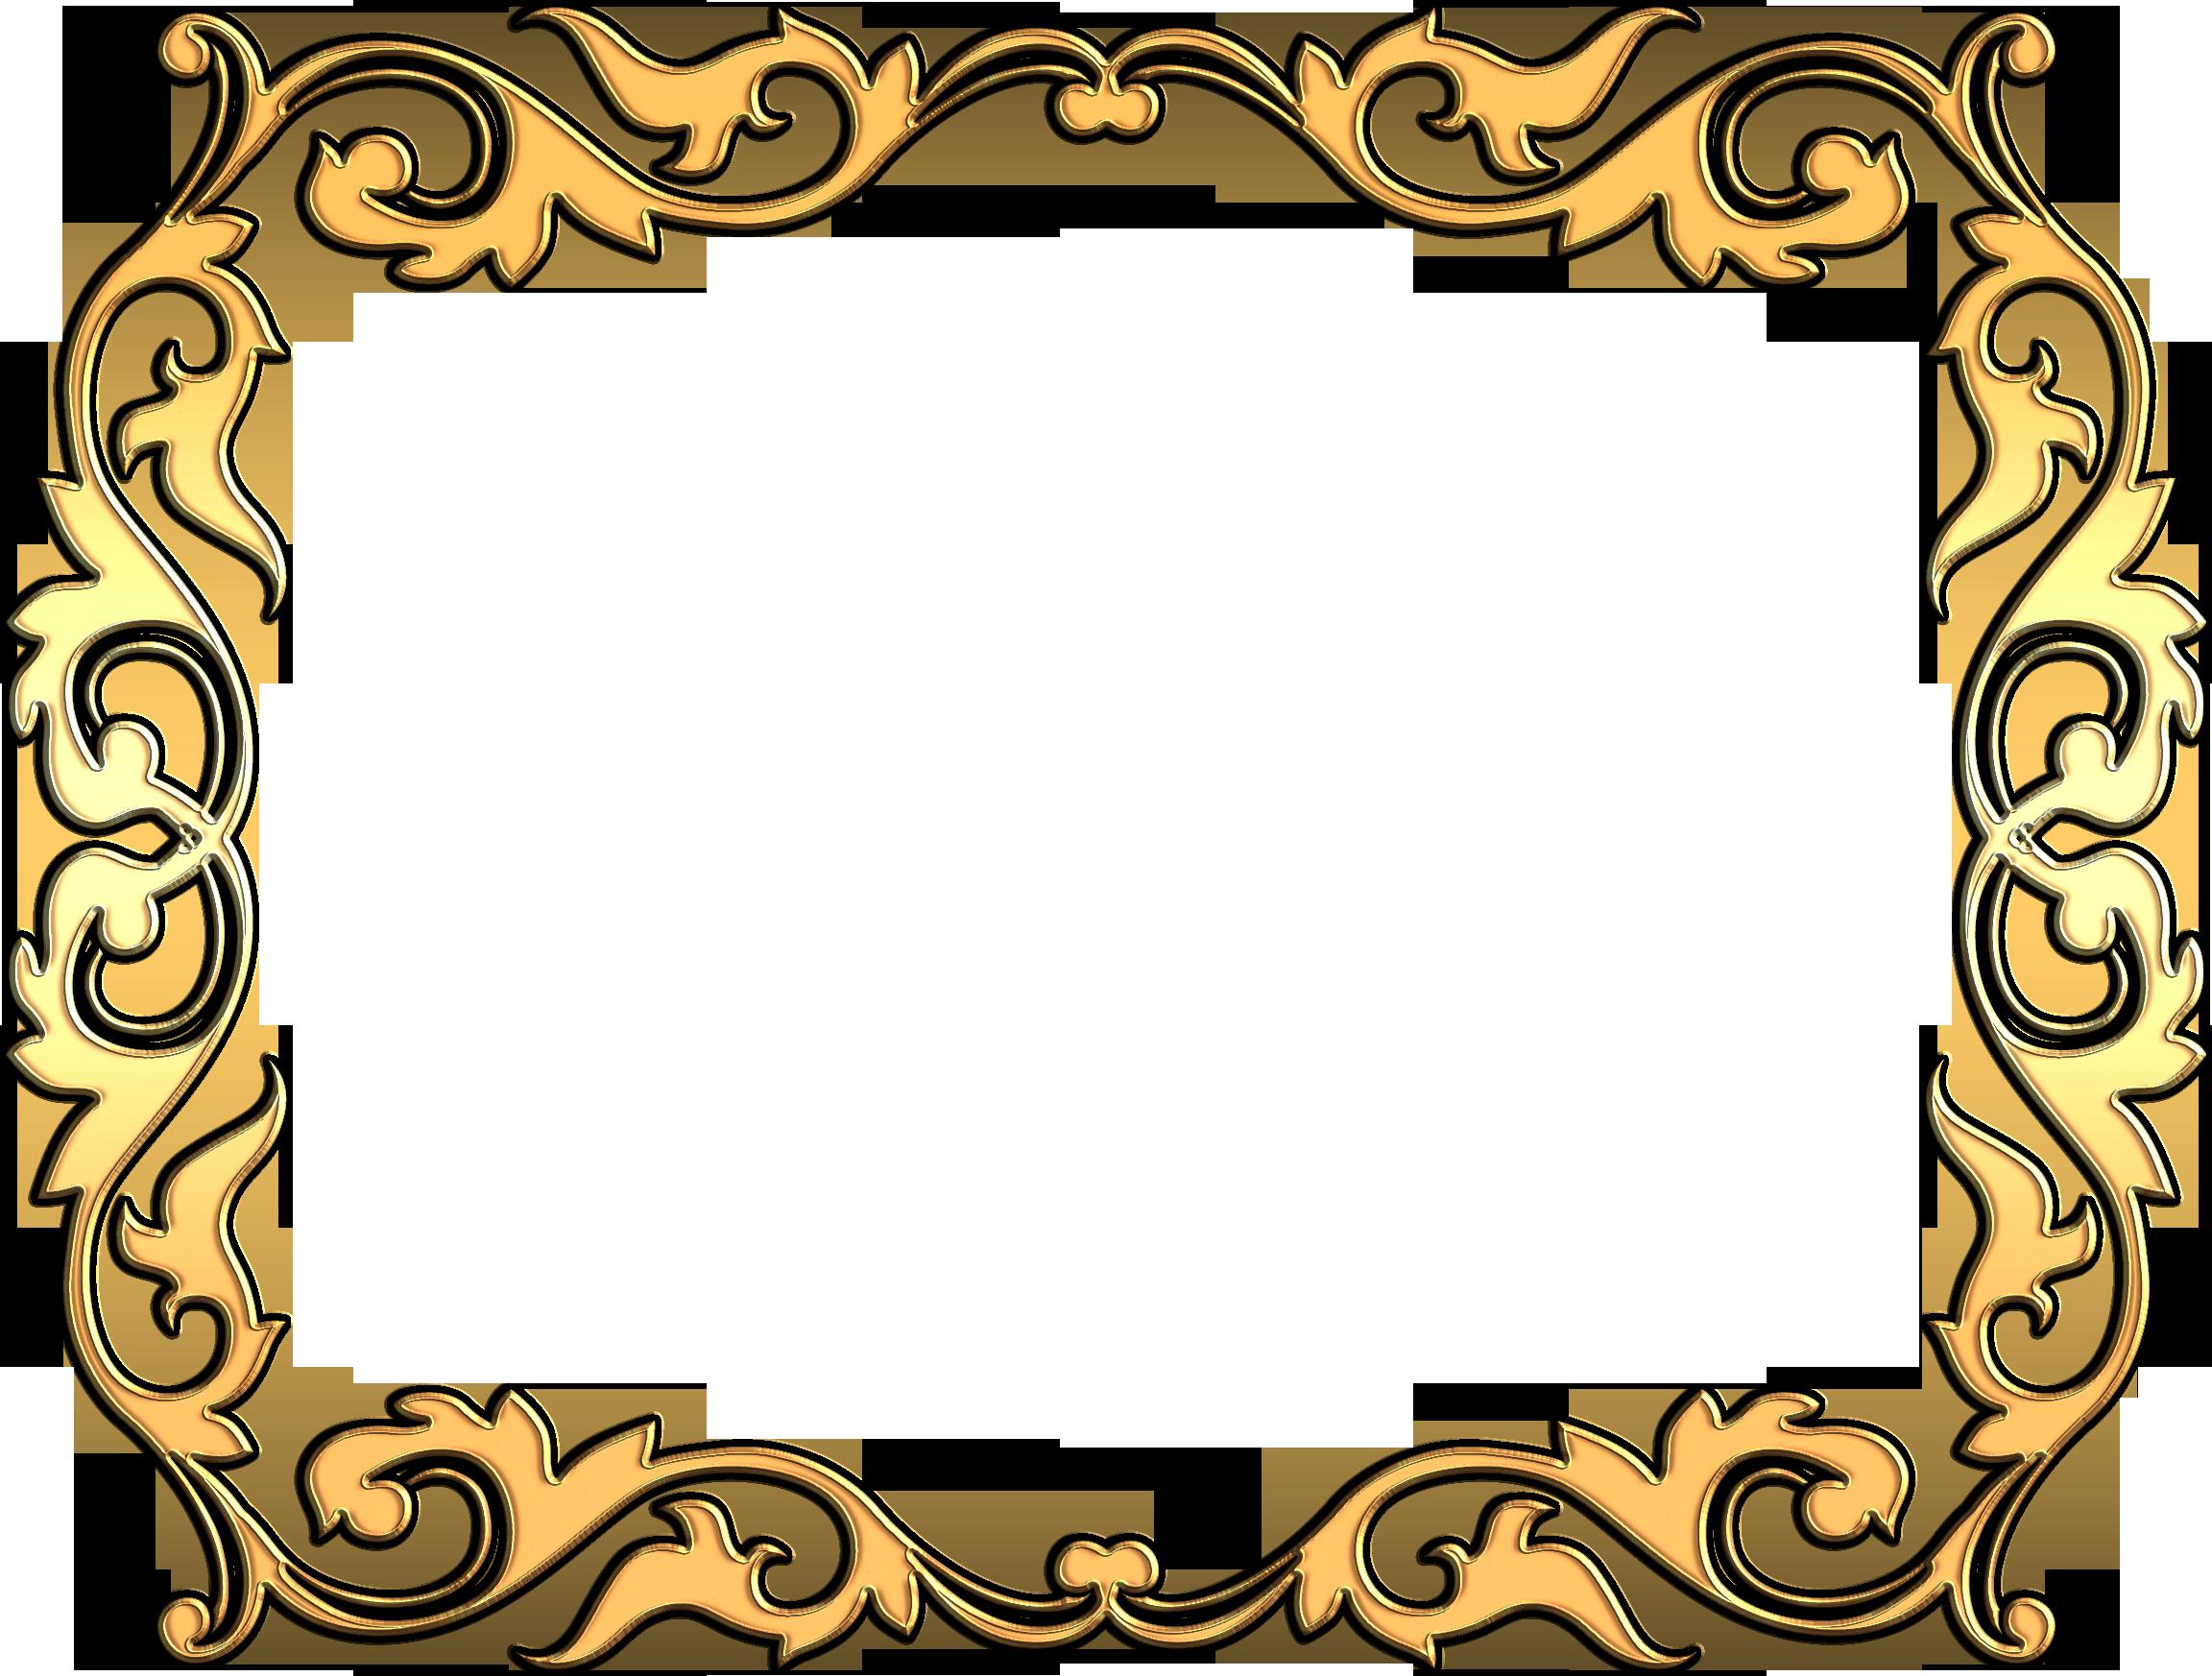 Pin de marcela guti rrez en bordes pinterest marcos - Marcos decorativos ...